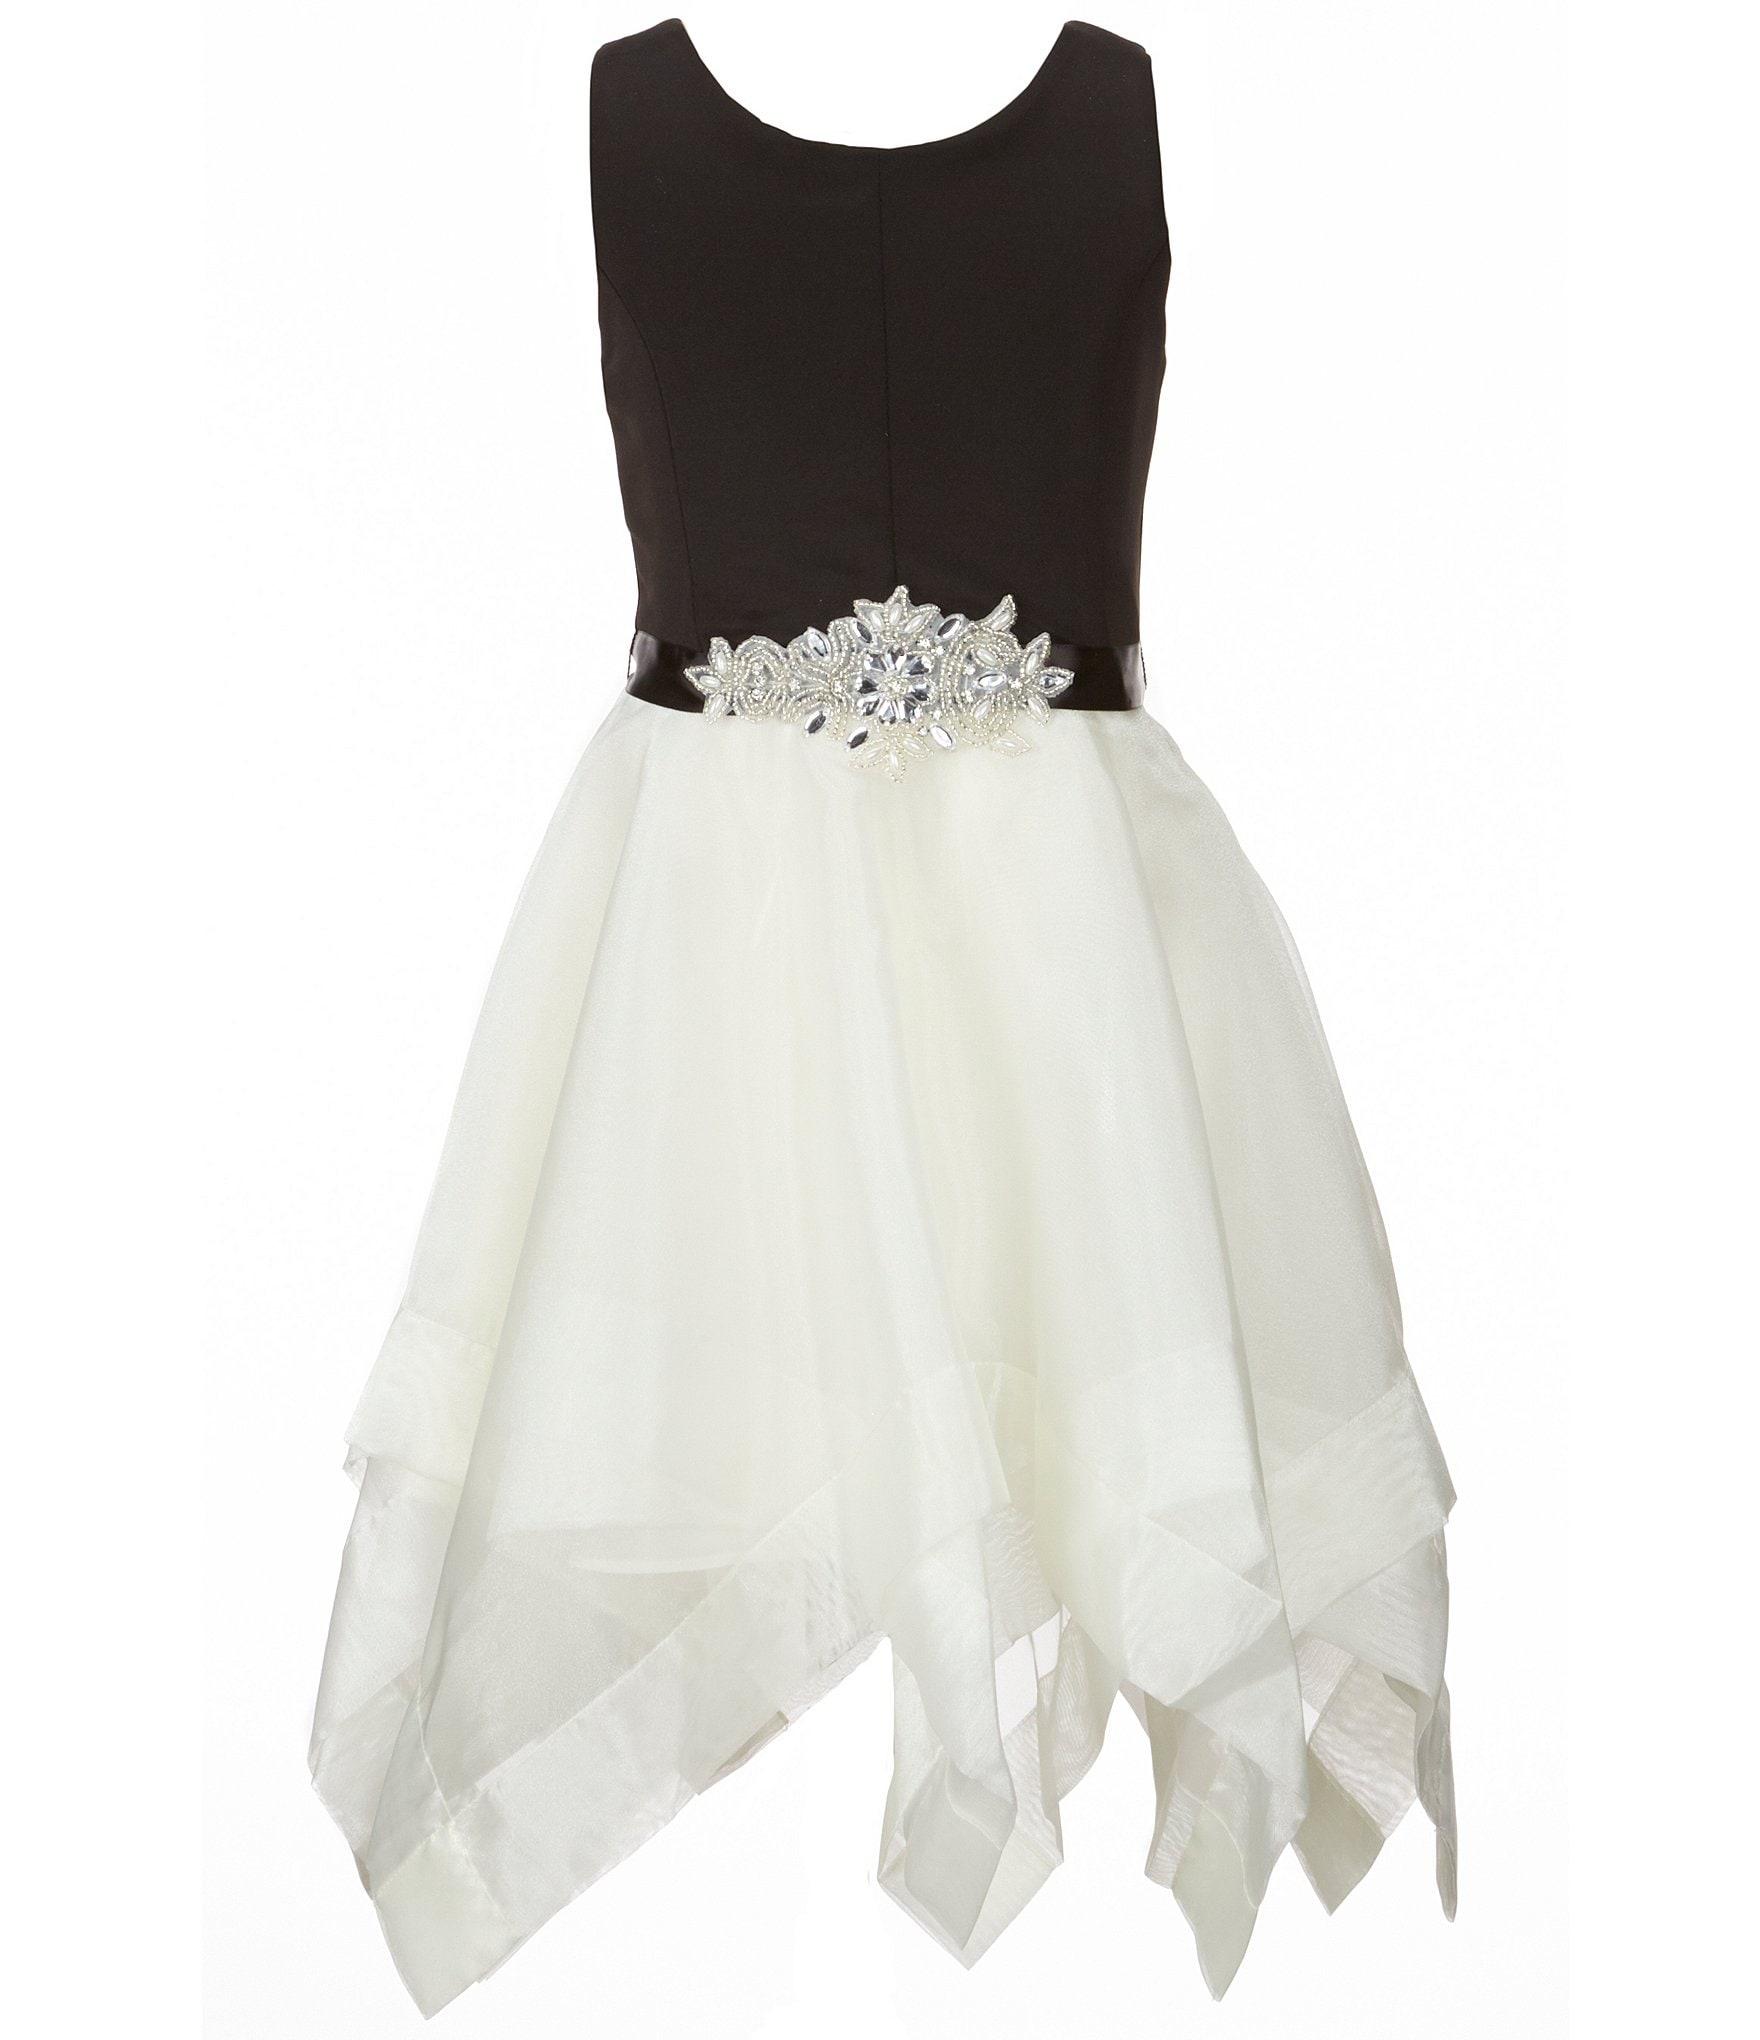 Girls Formal Dresses 7 16 Fashion Dresses